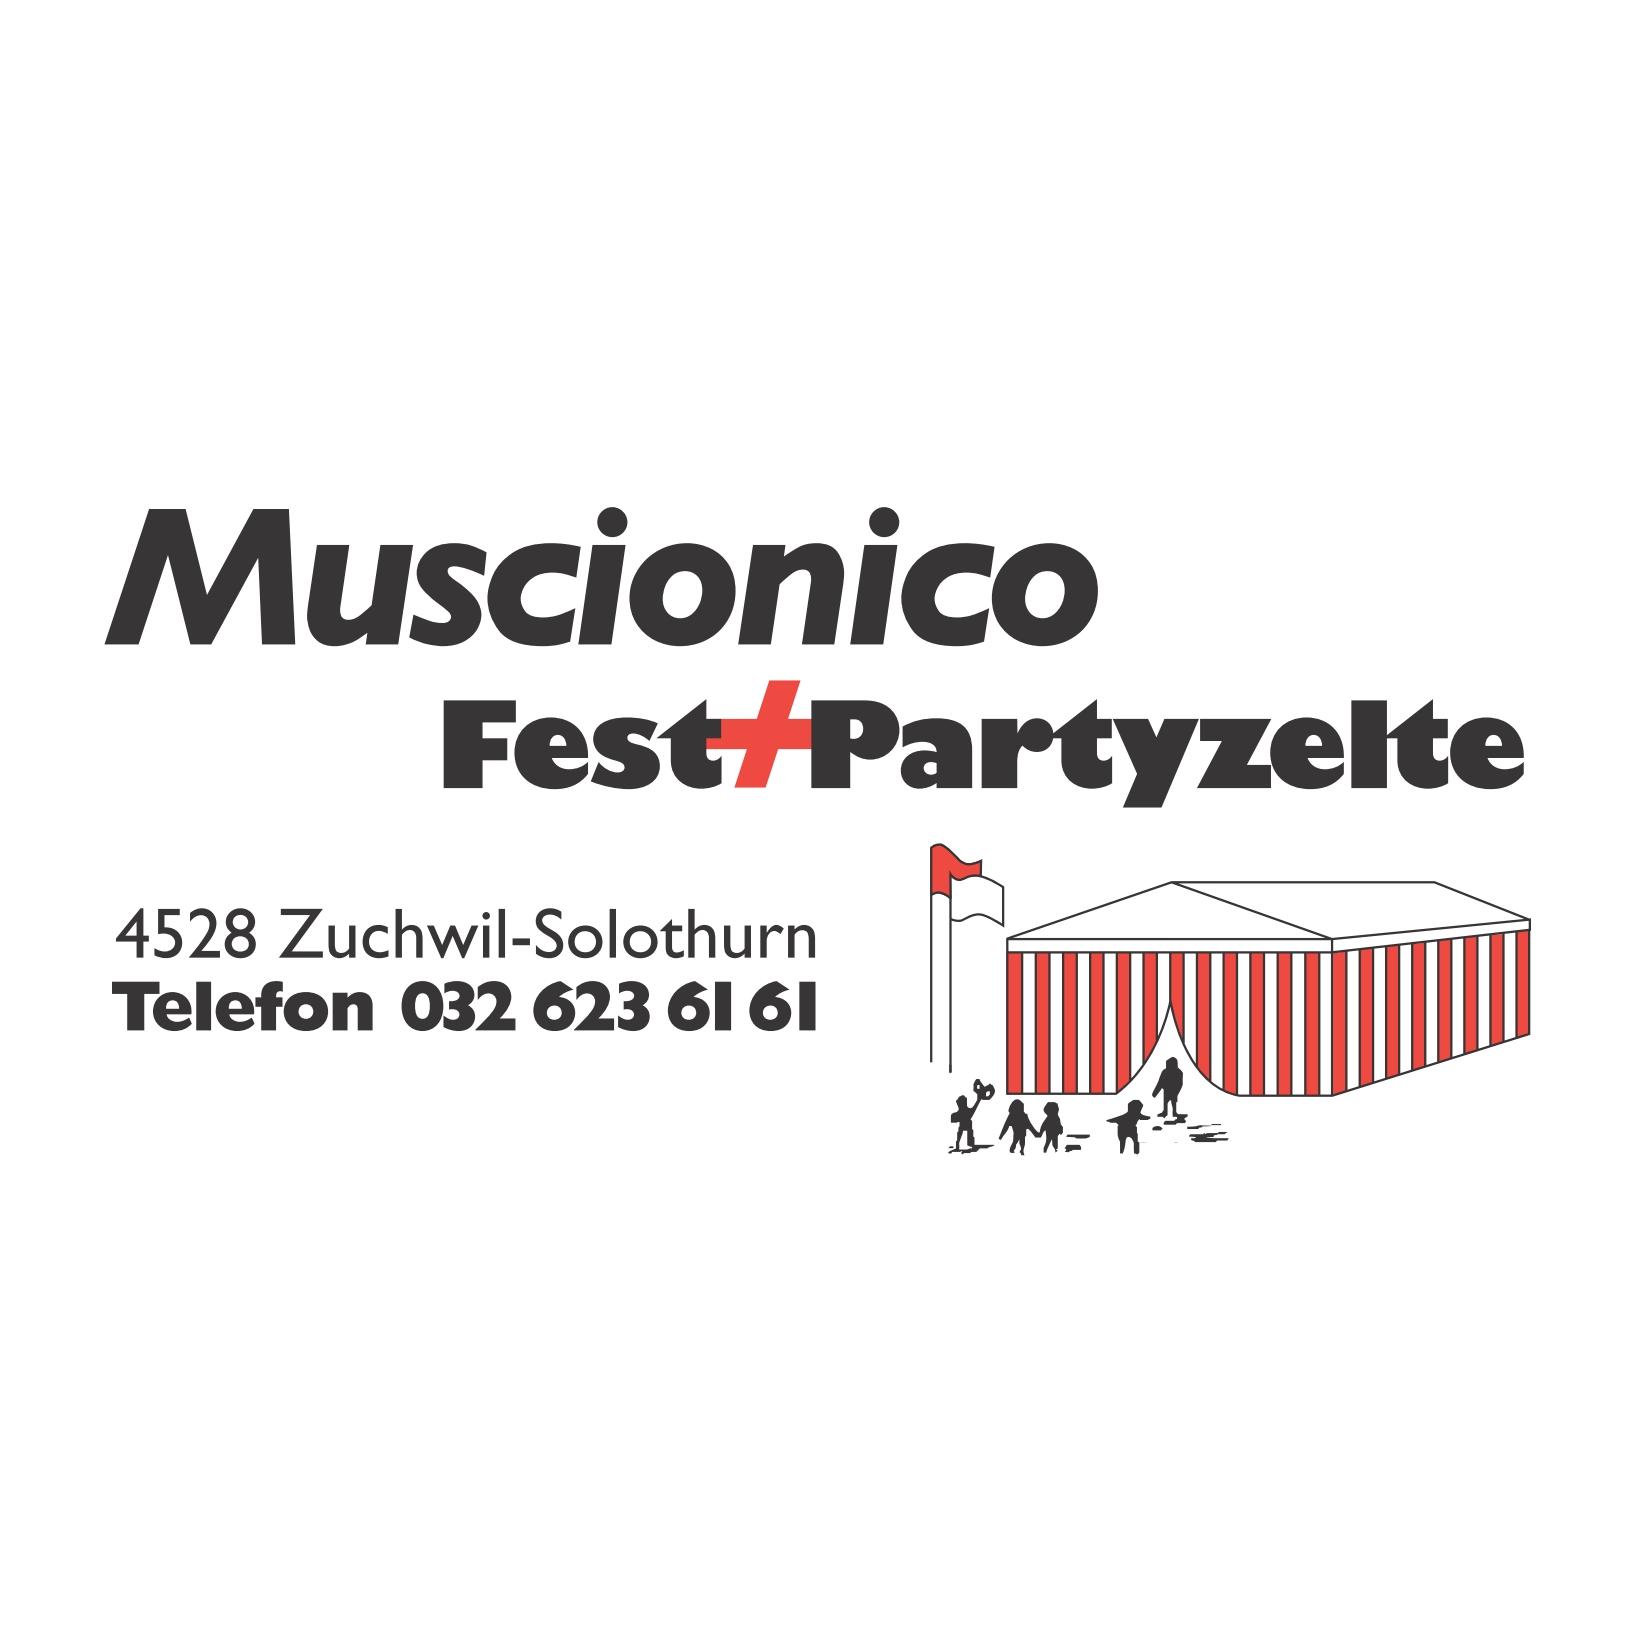 Muscionico GmbH Fest-& Paryzeltvermietung